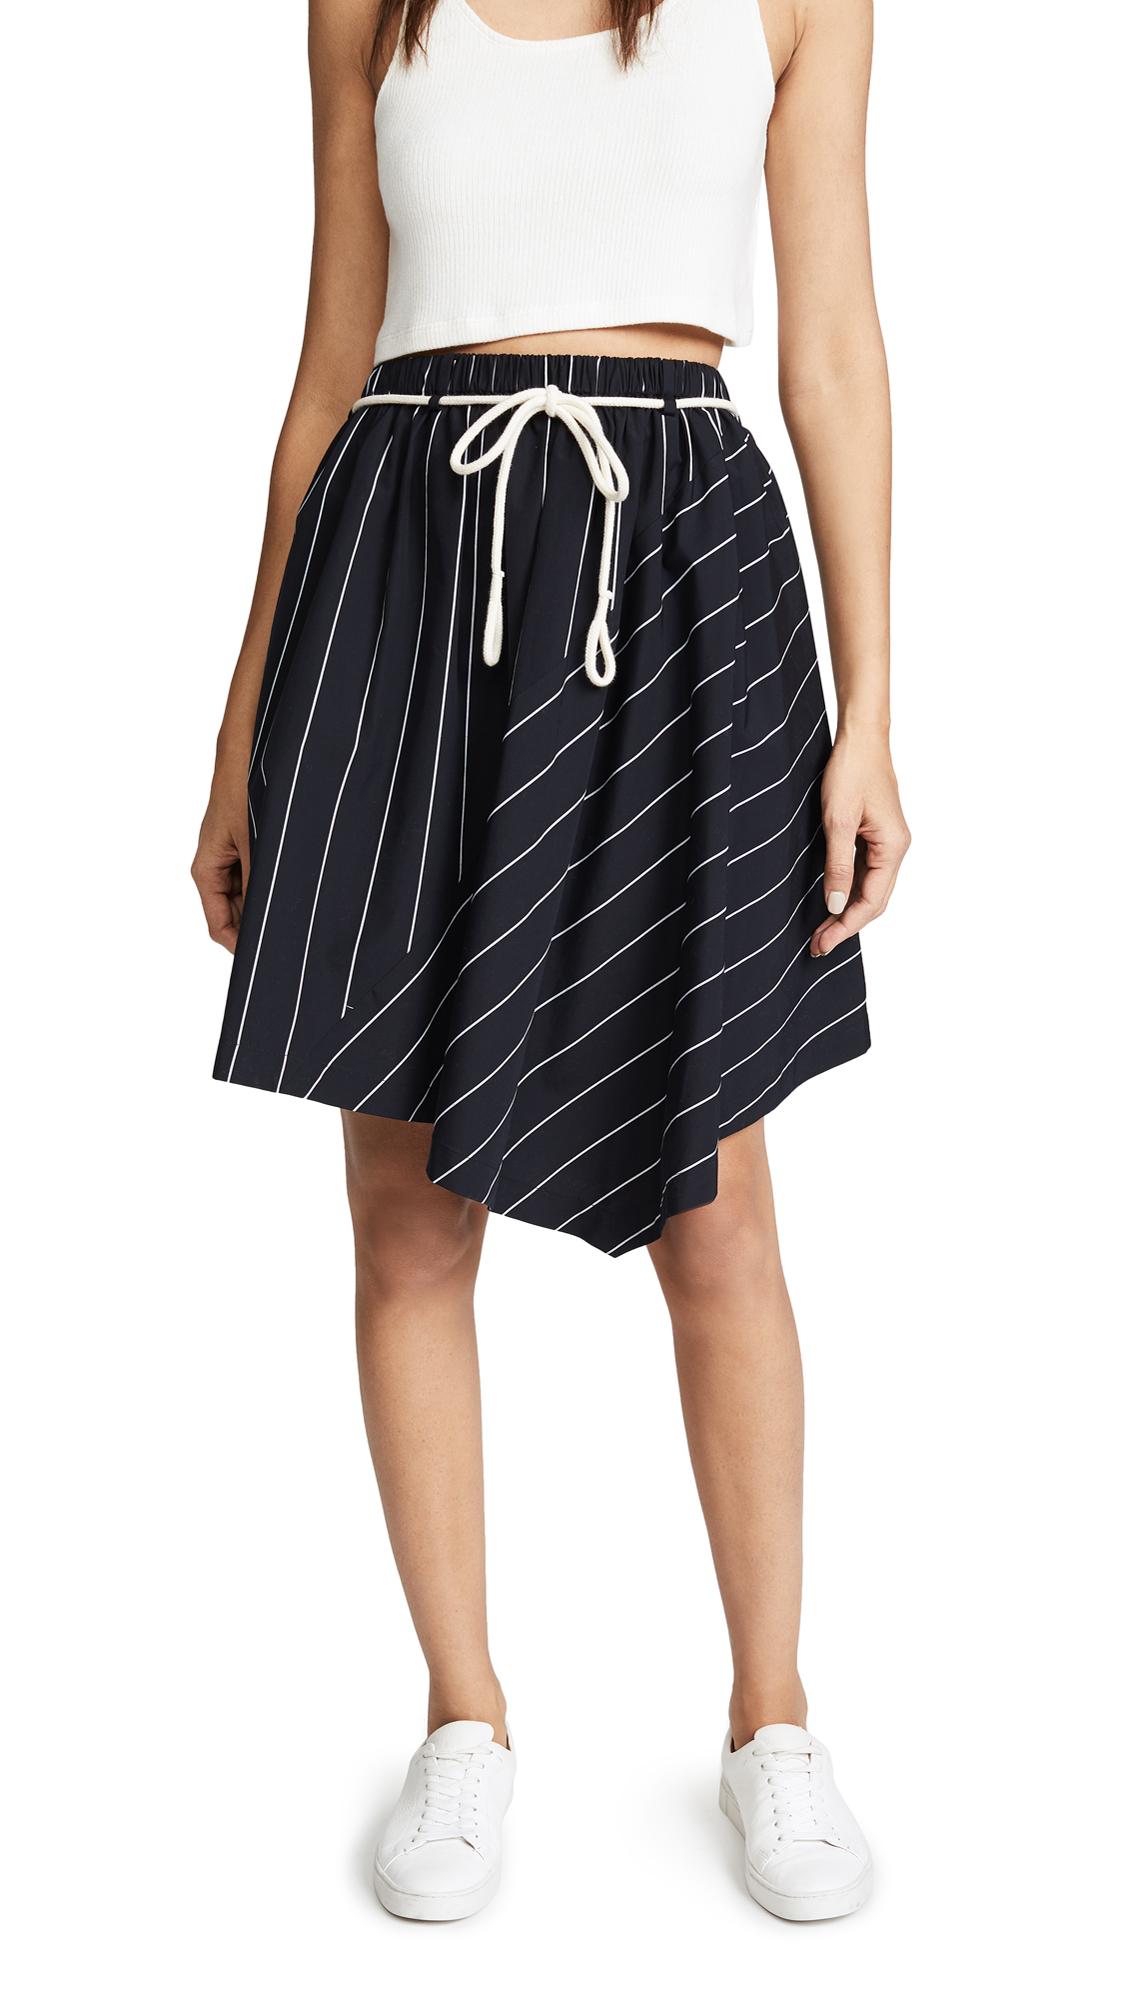 Vince Asymmetric Skirt In Coastal/Optic White